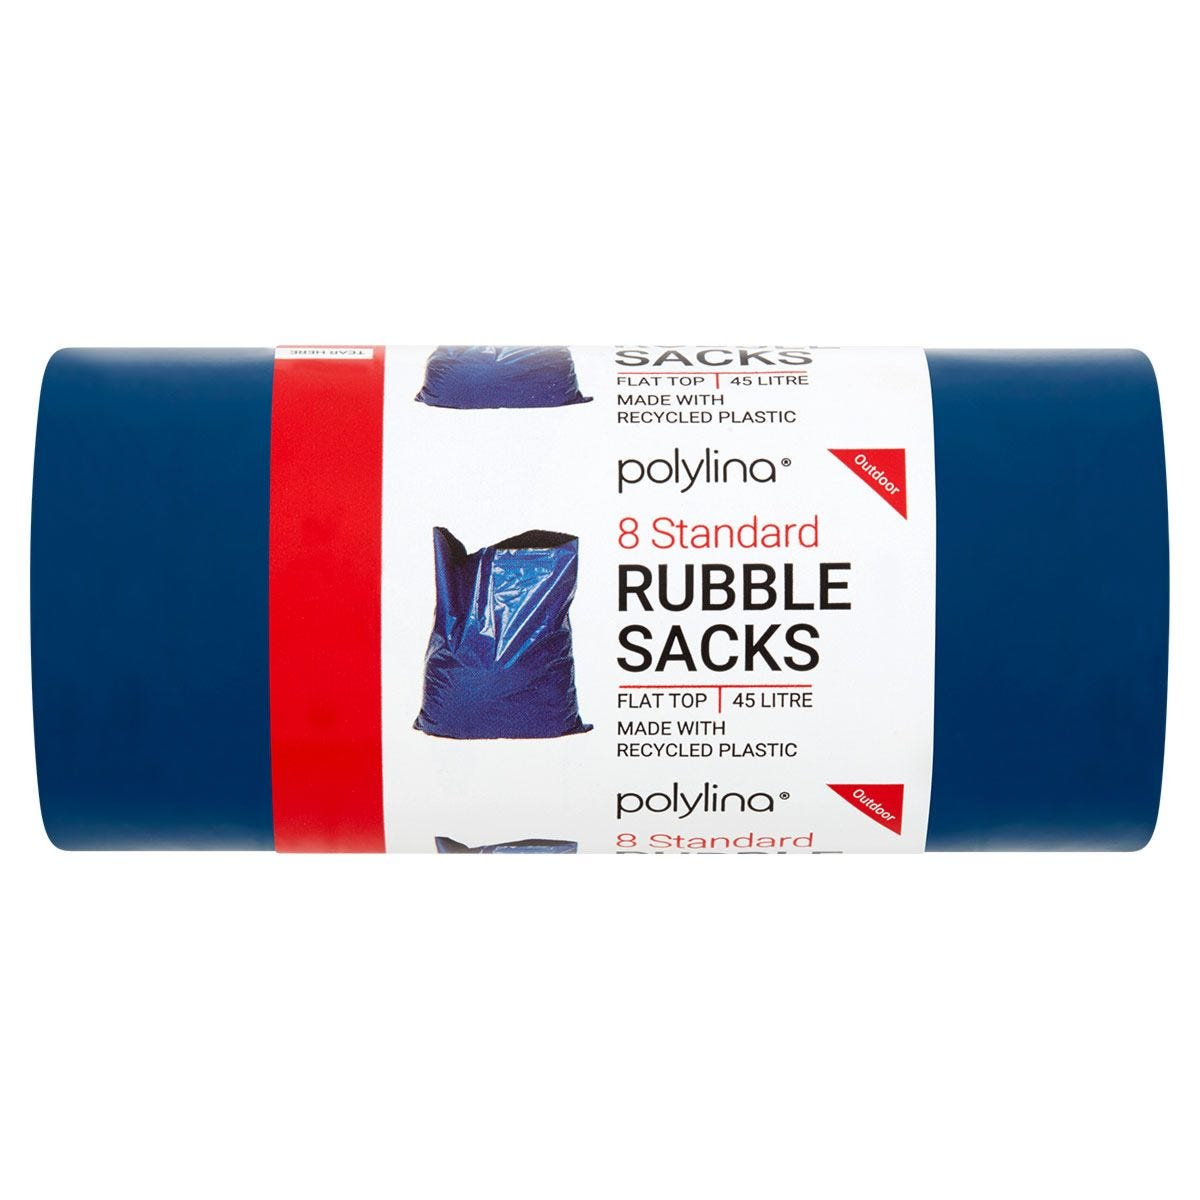 Polylina Large Heavy Duty Rubble Sacks - Pack of 8